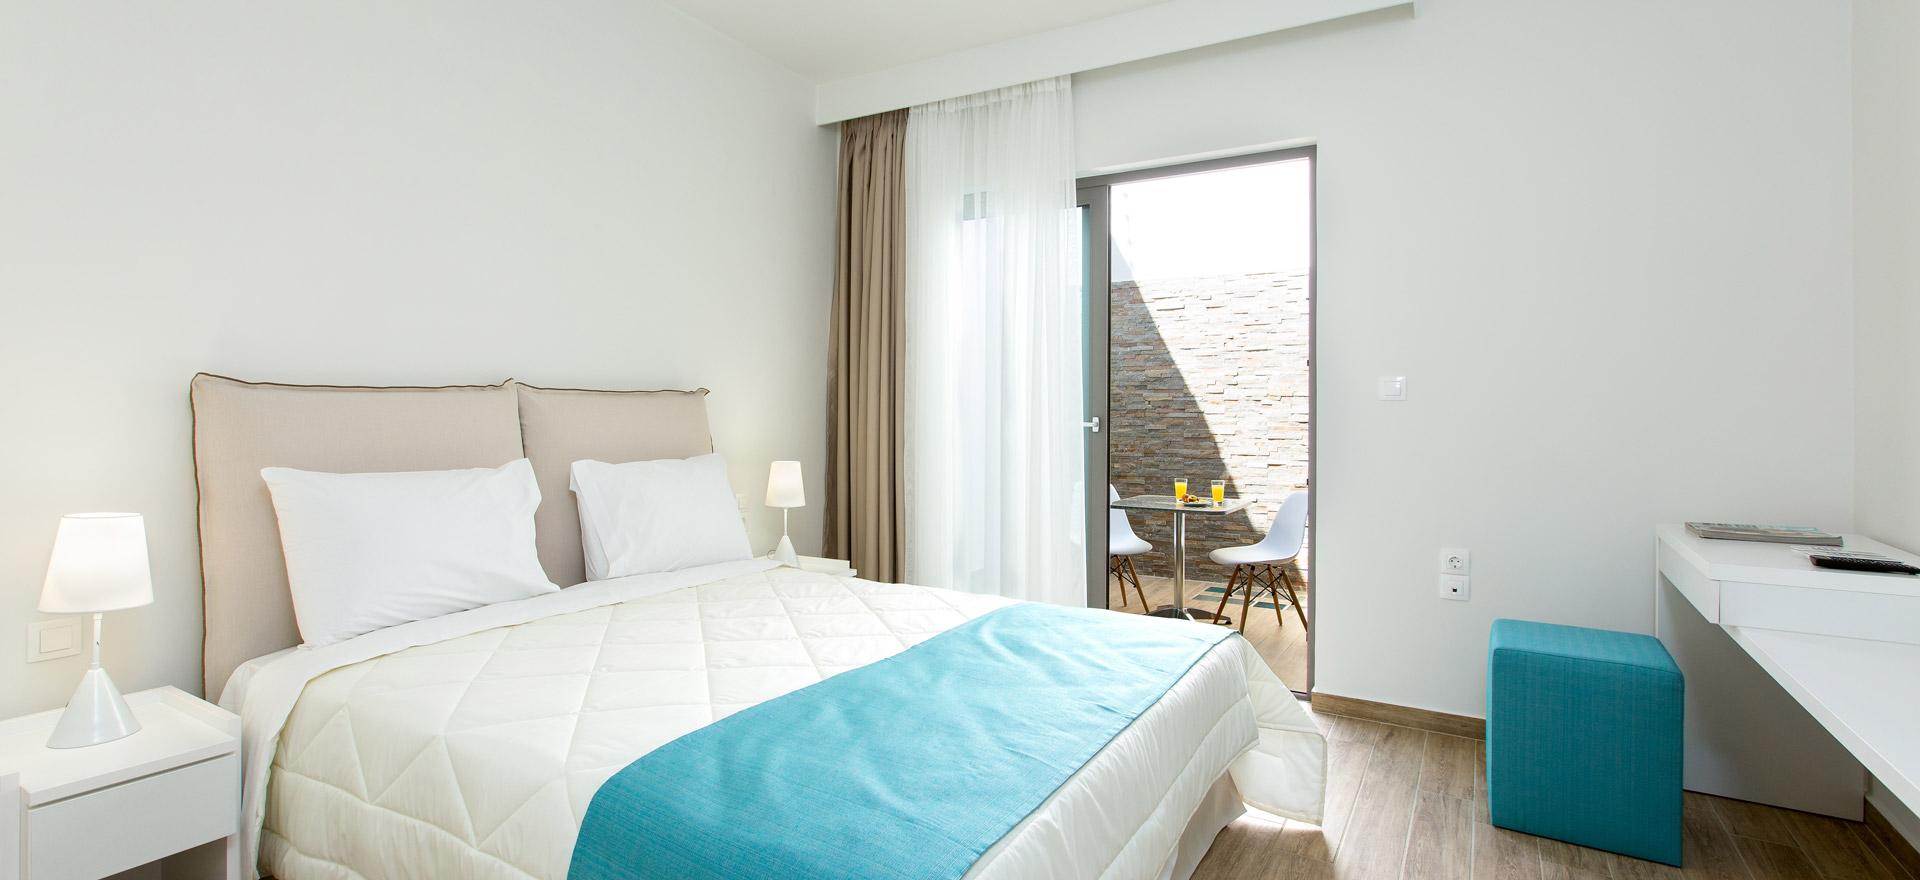 Golden Coast Apartments - Luxury rooms